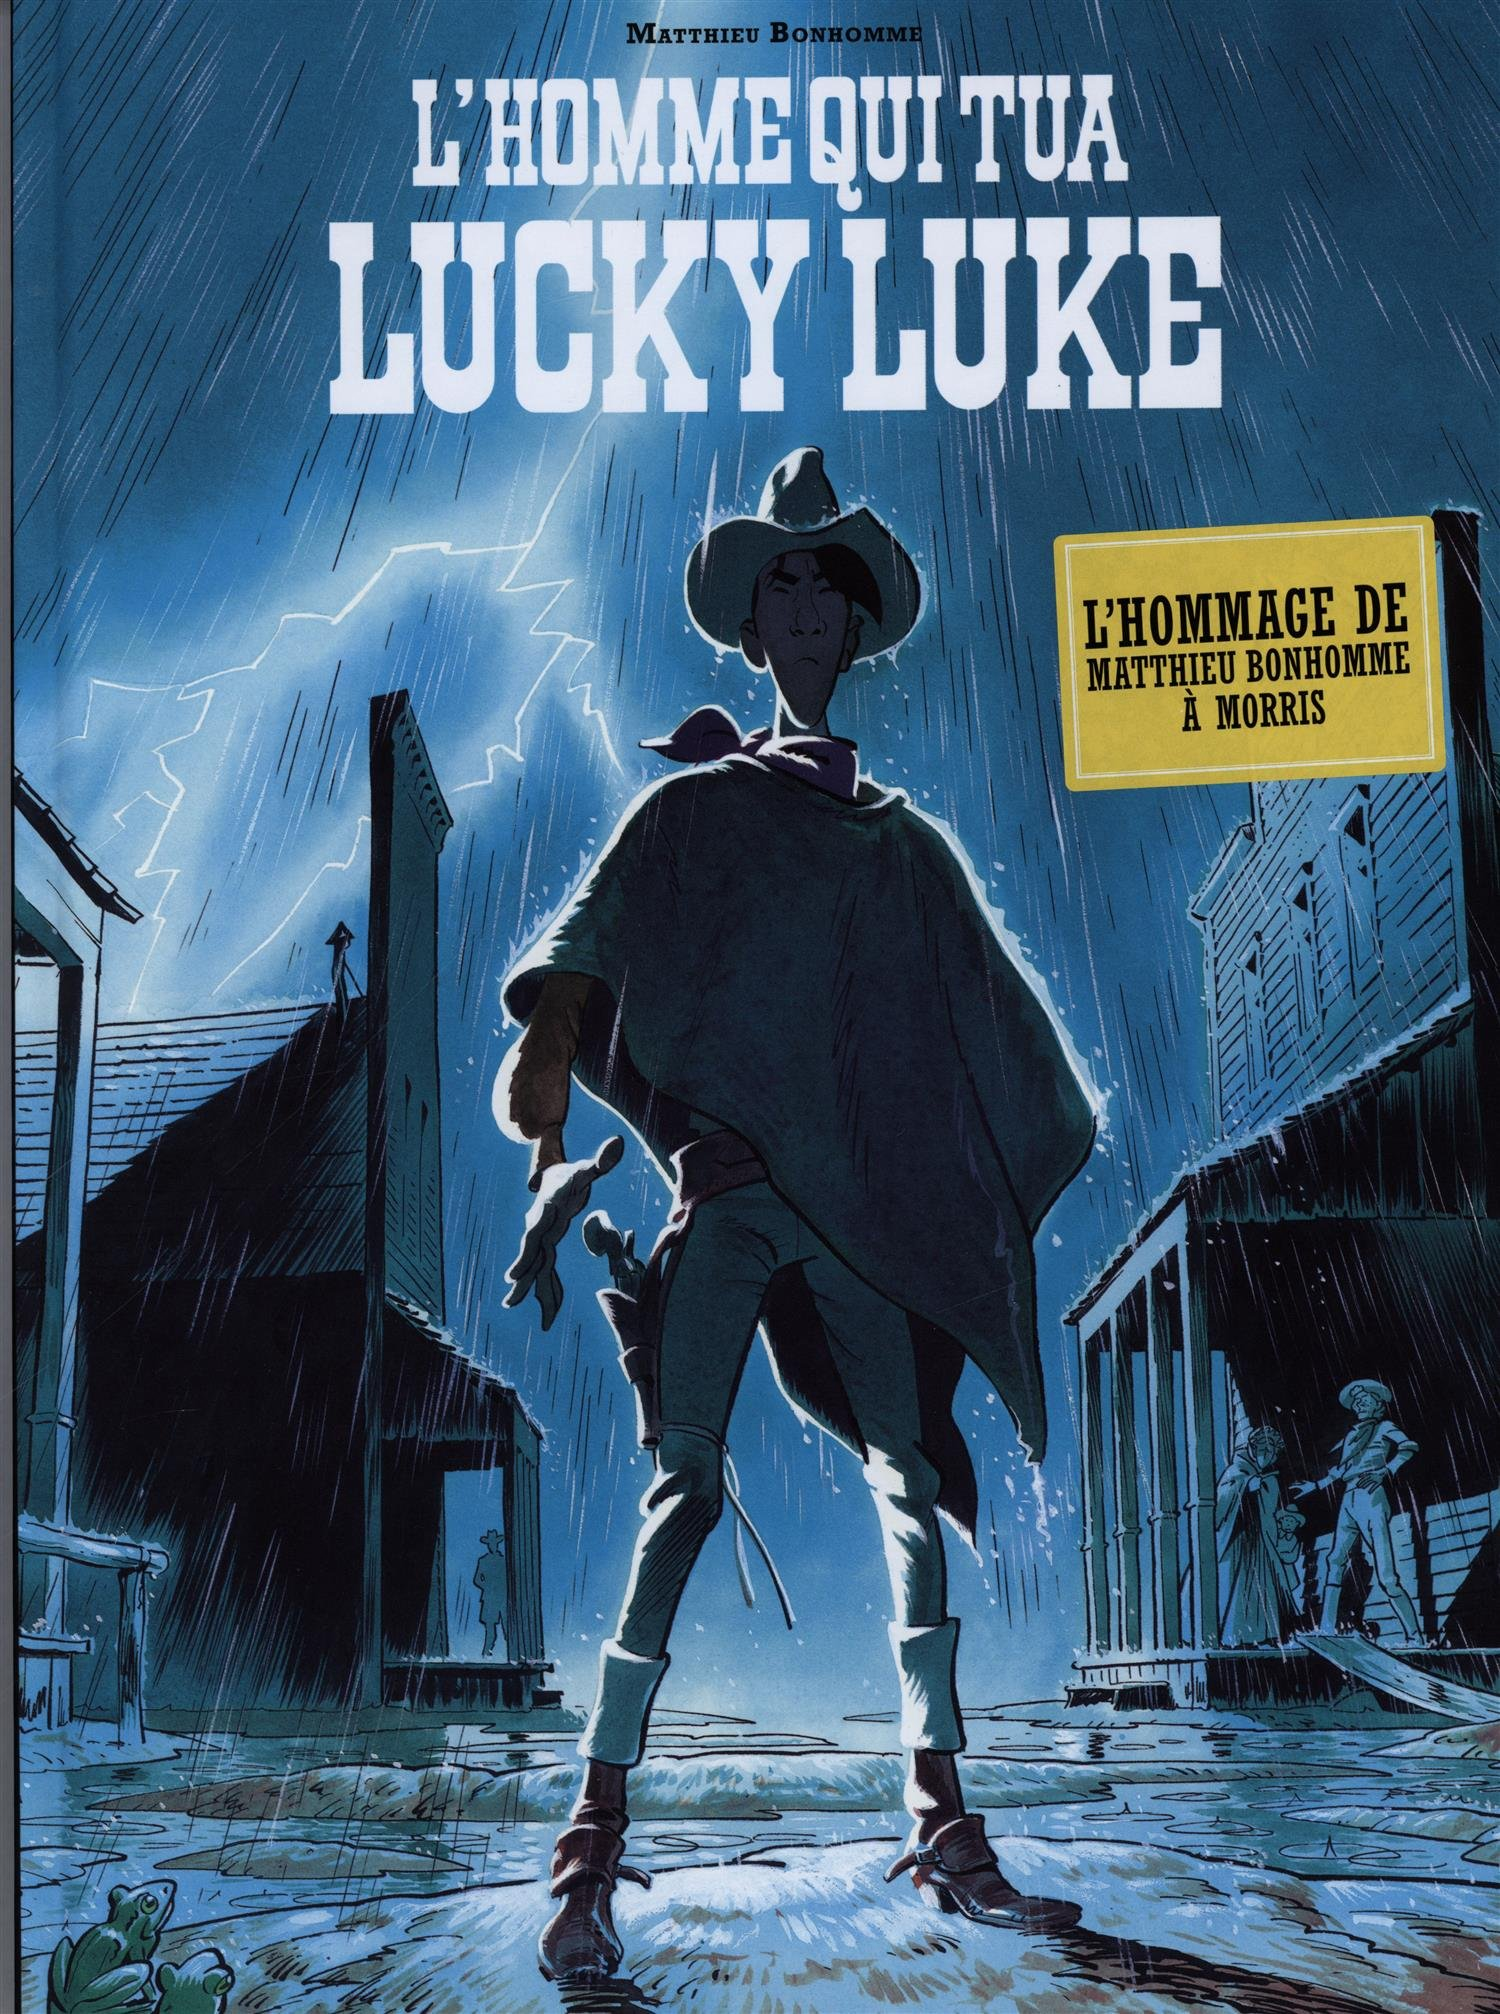 L'homme qui tua Lucky Luke  - Homme qui tua Lucky Luke (L') - tome 0 - Homme qui tua Lucky Luke (L')